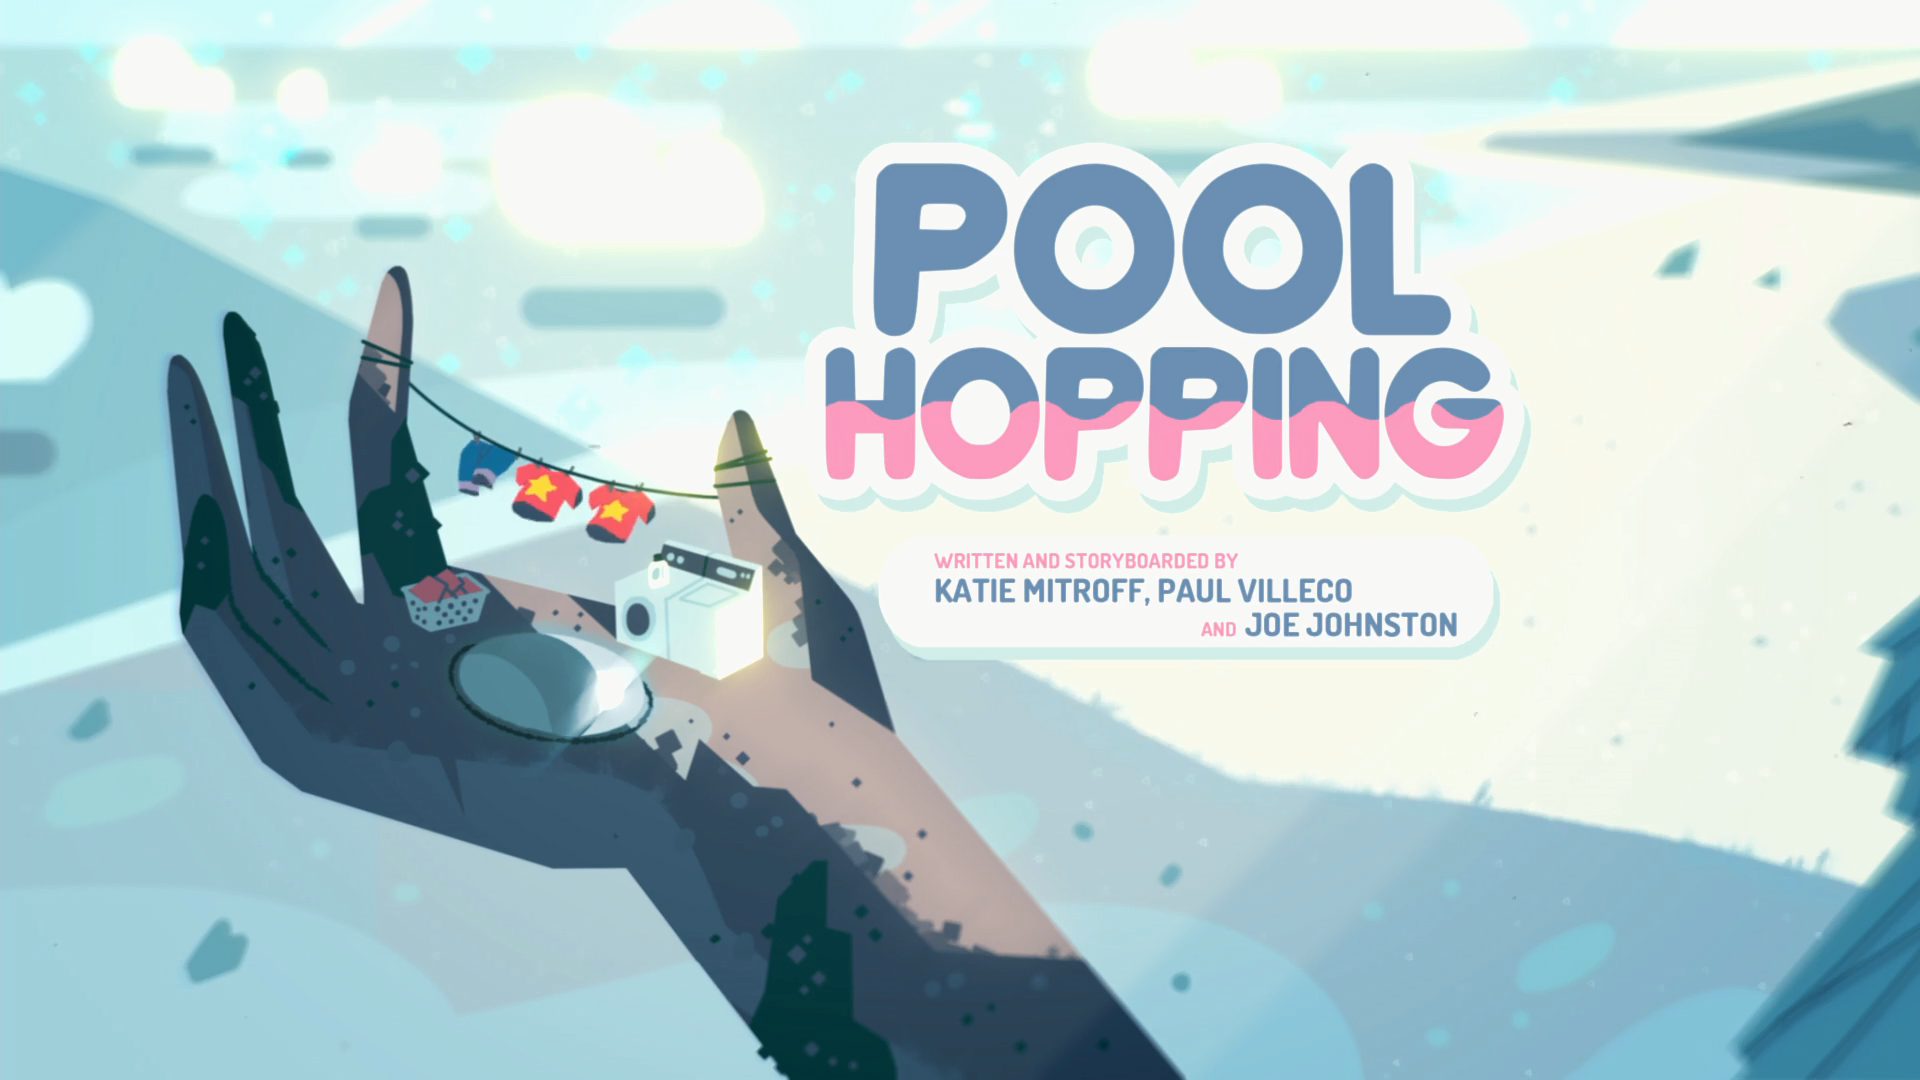 Pool Hopping/Gallery